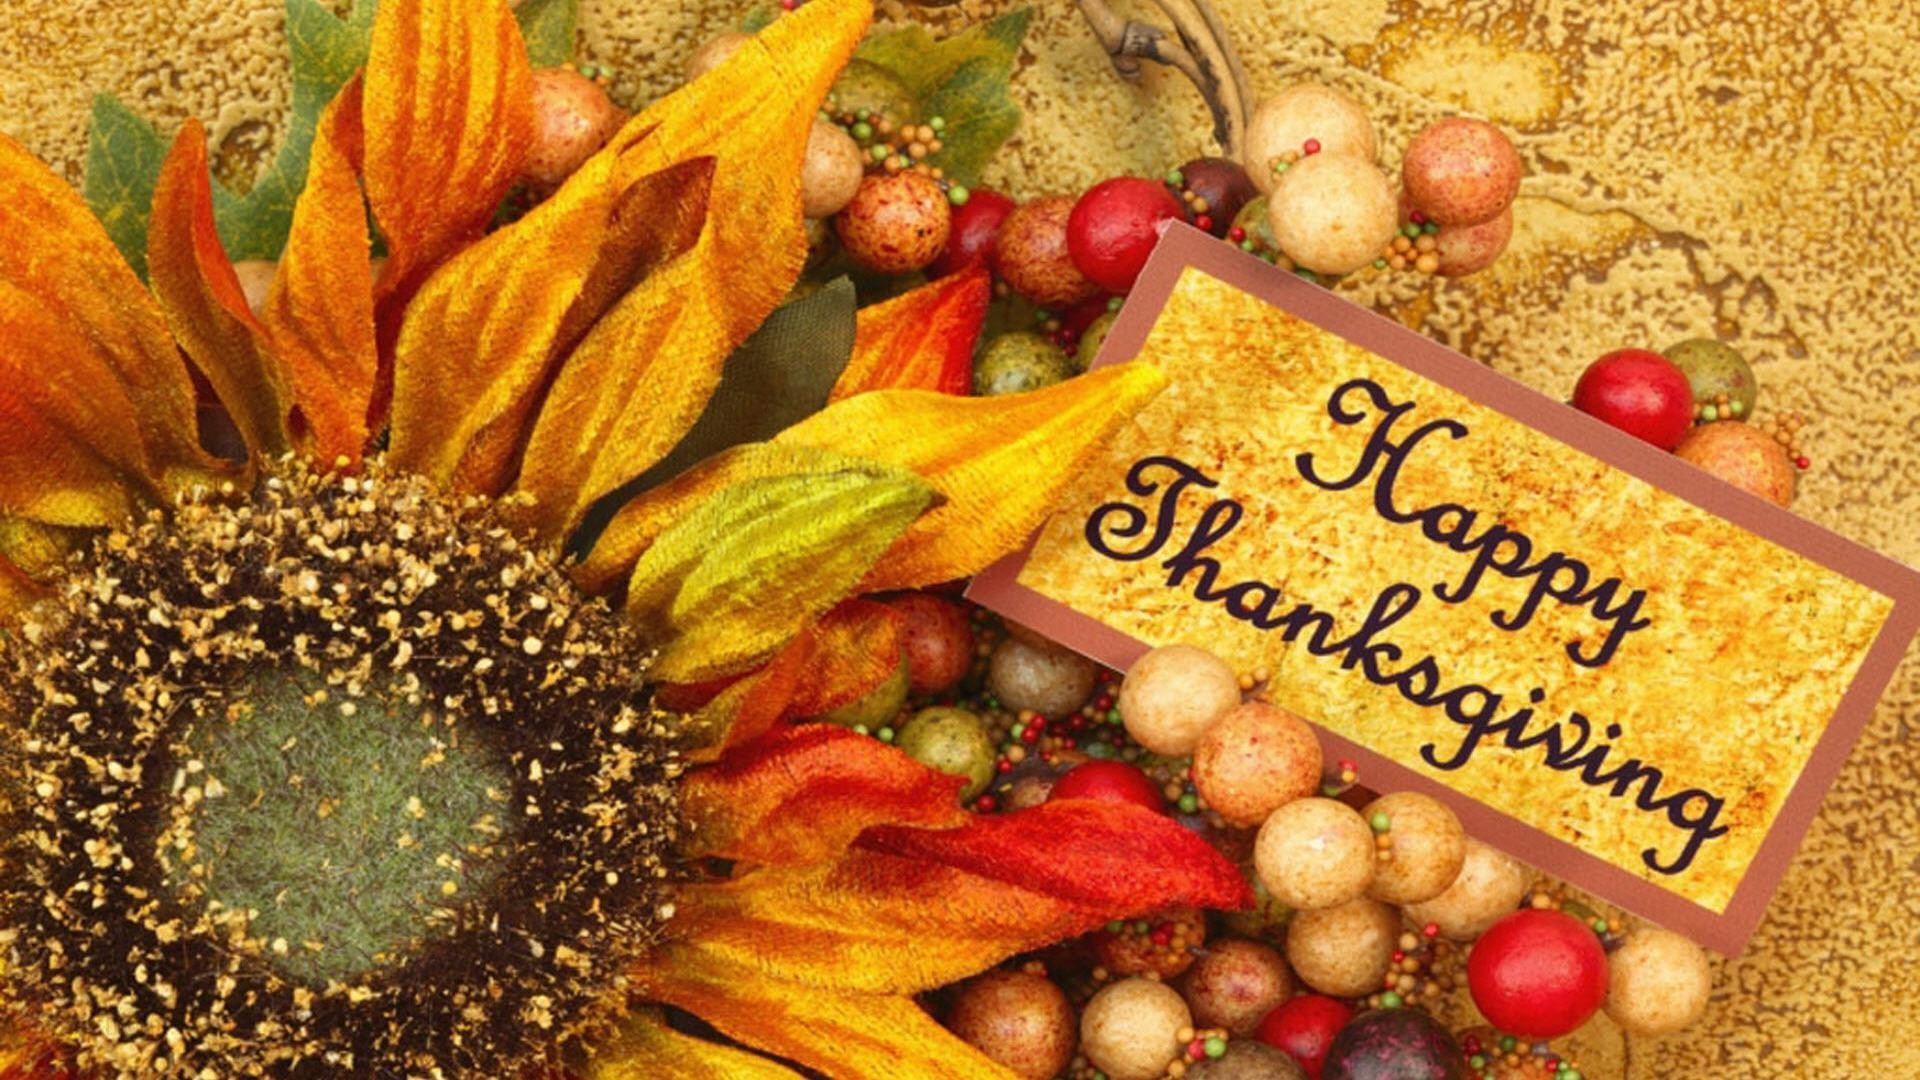 Precious Moments Thanksgiving Wallpaper 42 Images